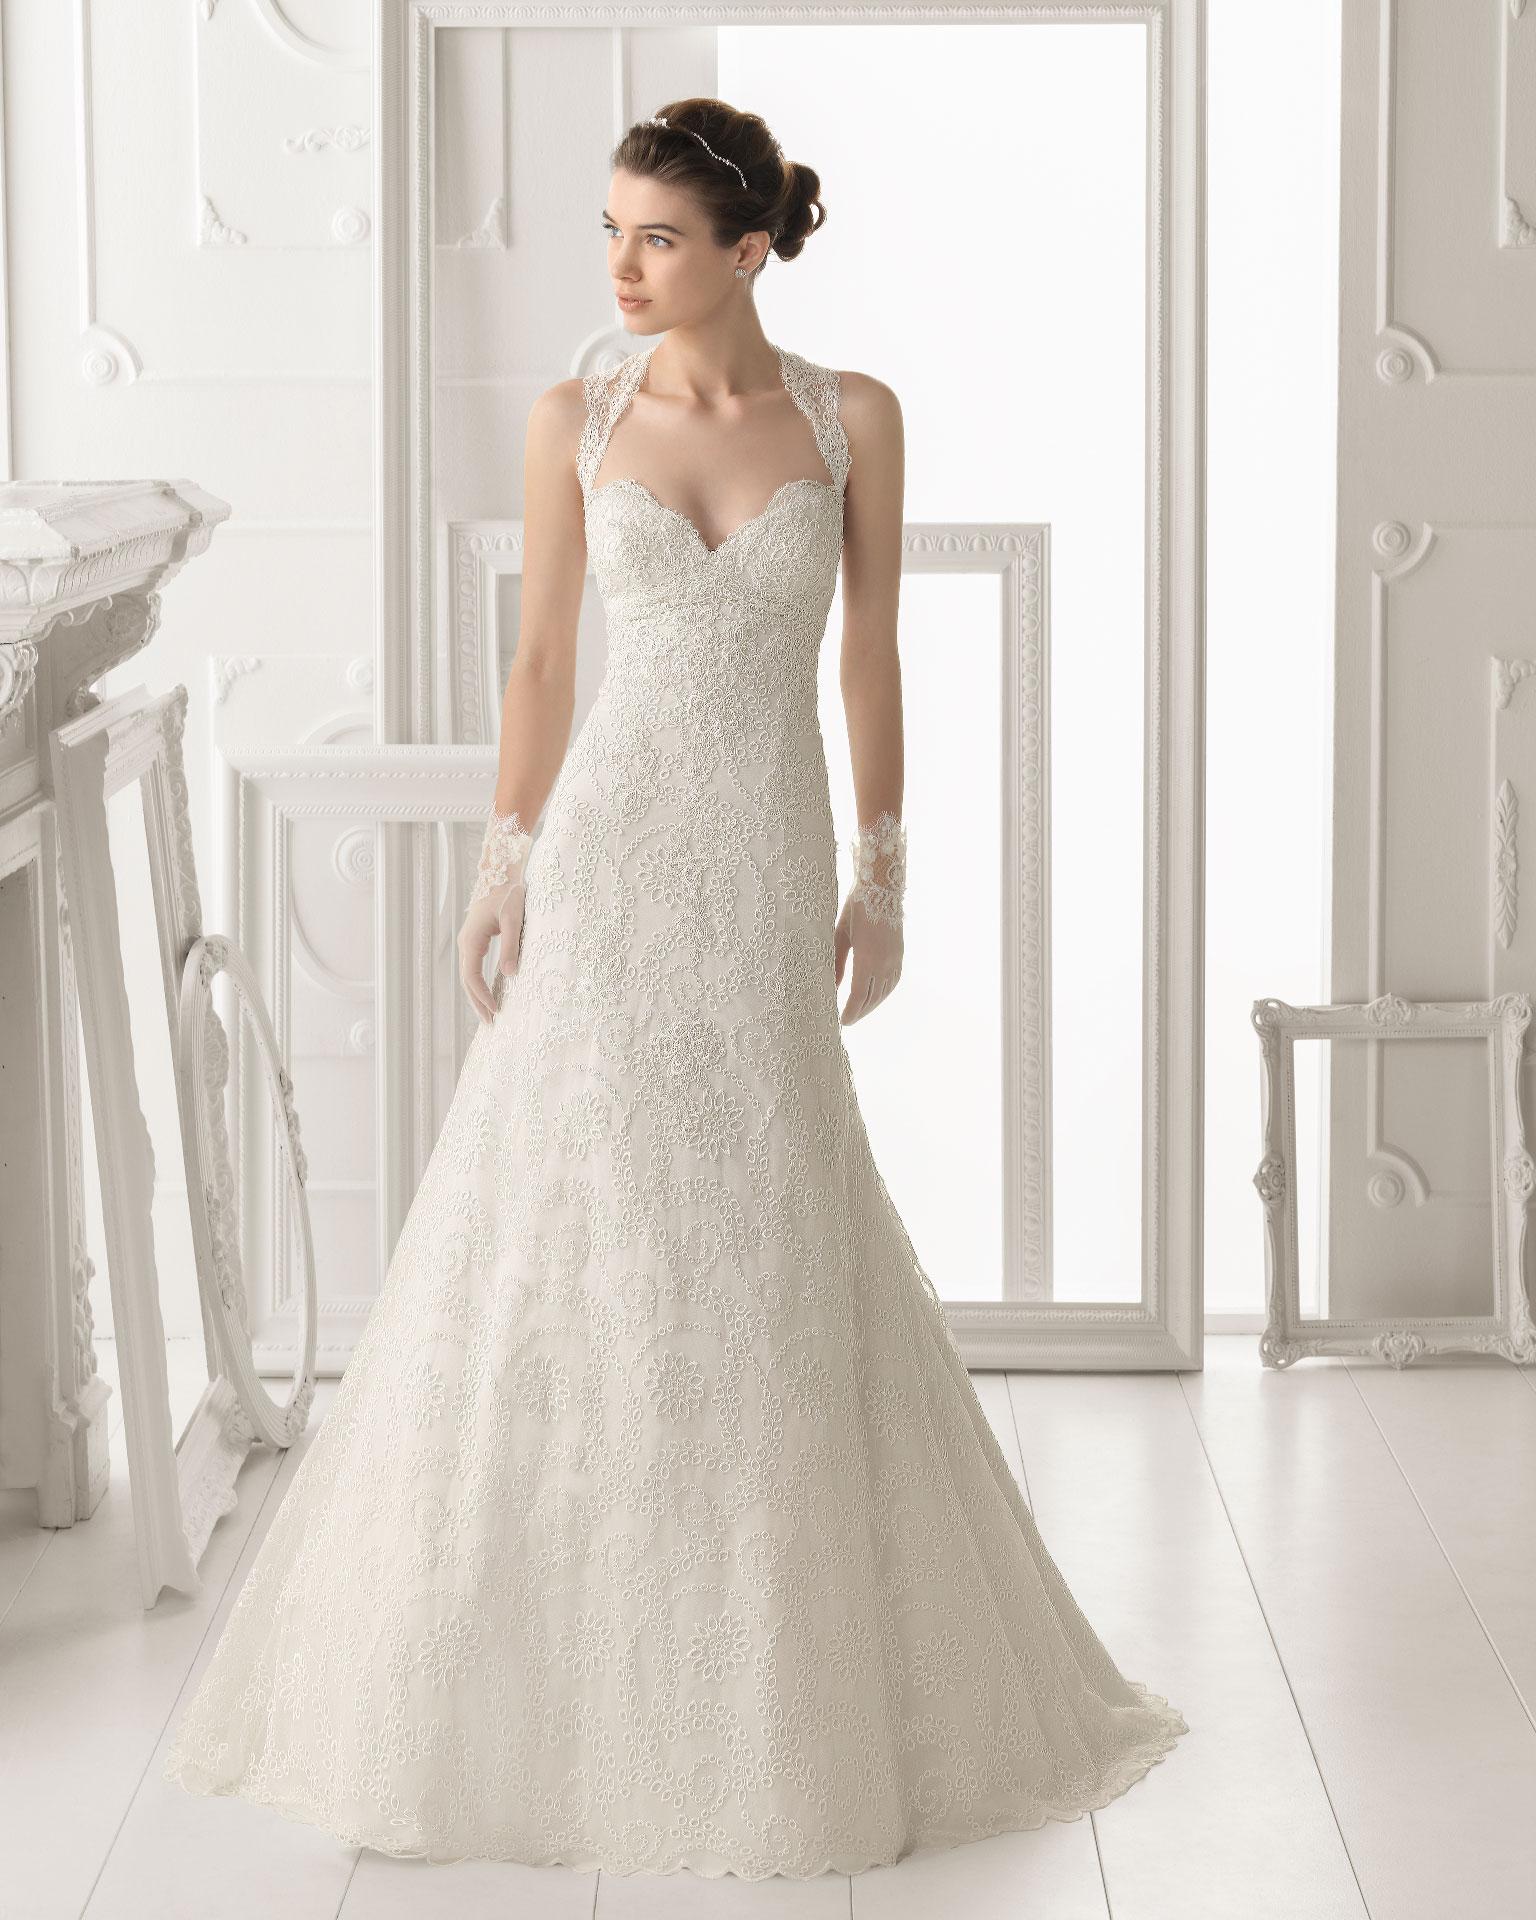 Aire barcelona wedding dress 2014 bridal otonal for Wedding dresses in barcelona spain